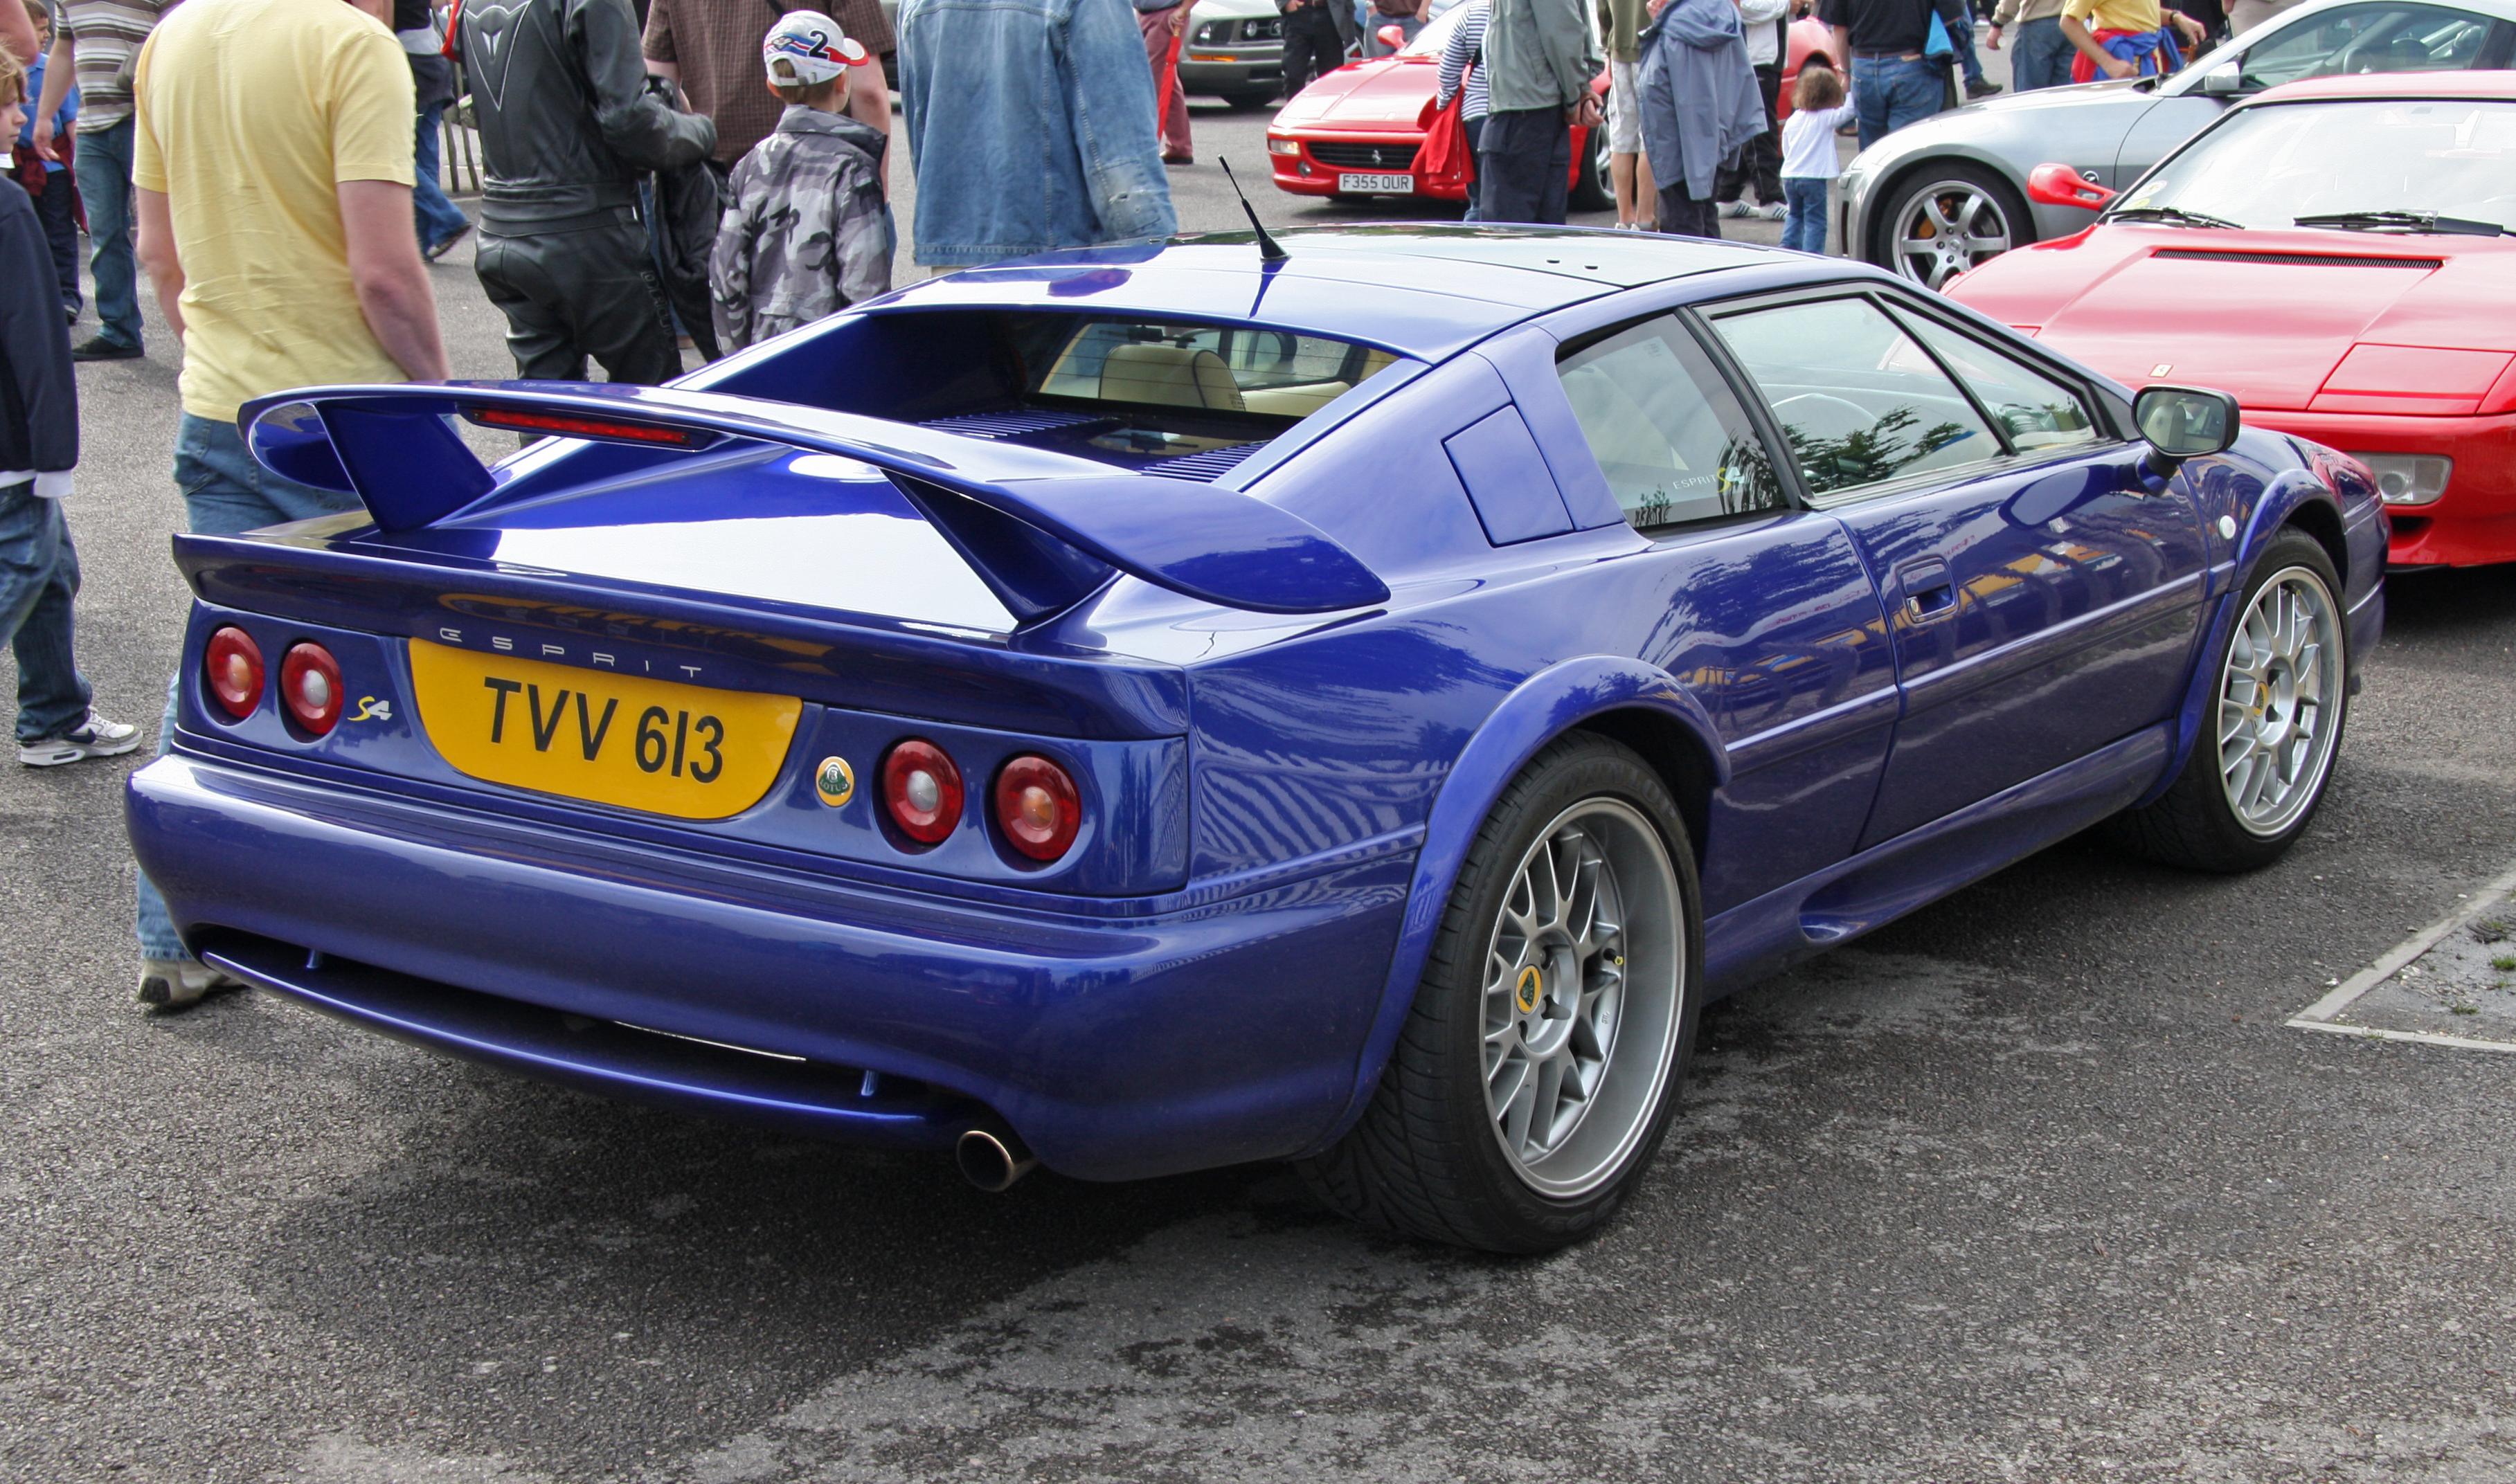 Lotus_Esprit_S4_-_Flickr_-_exfordy Inspiring Lotus Carlton for Sale Autotrader Cars Trend